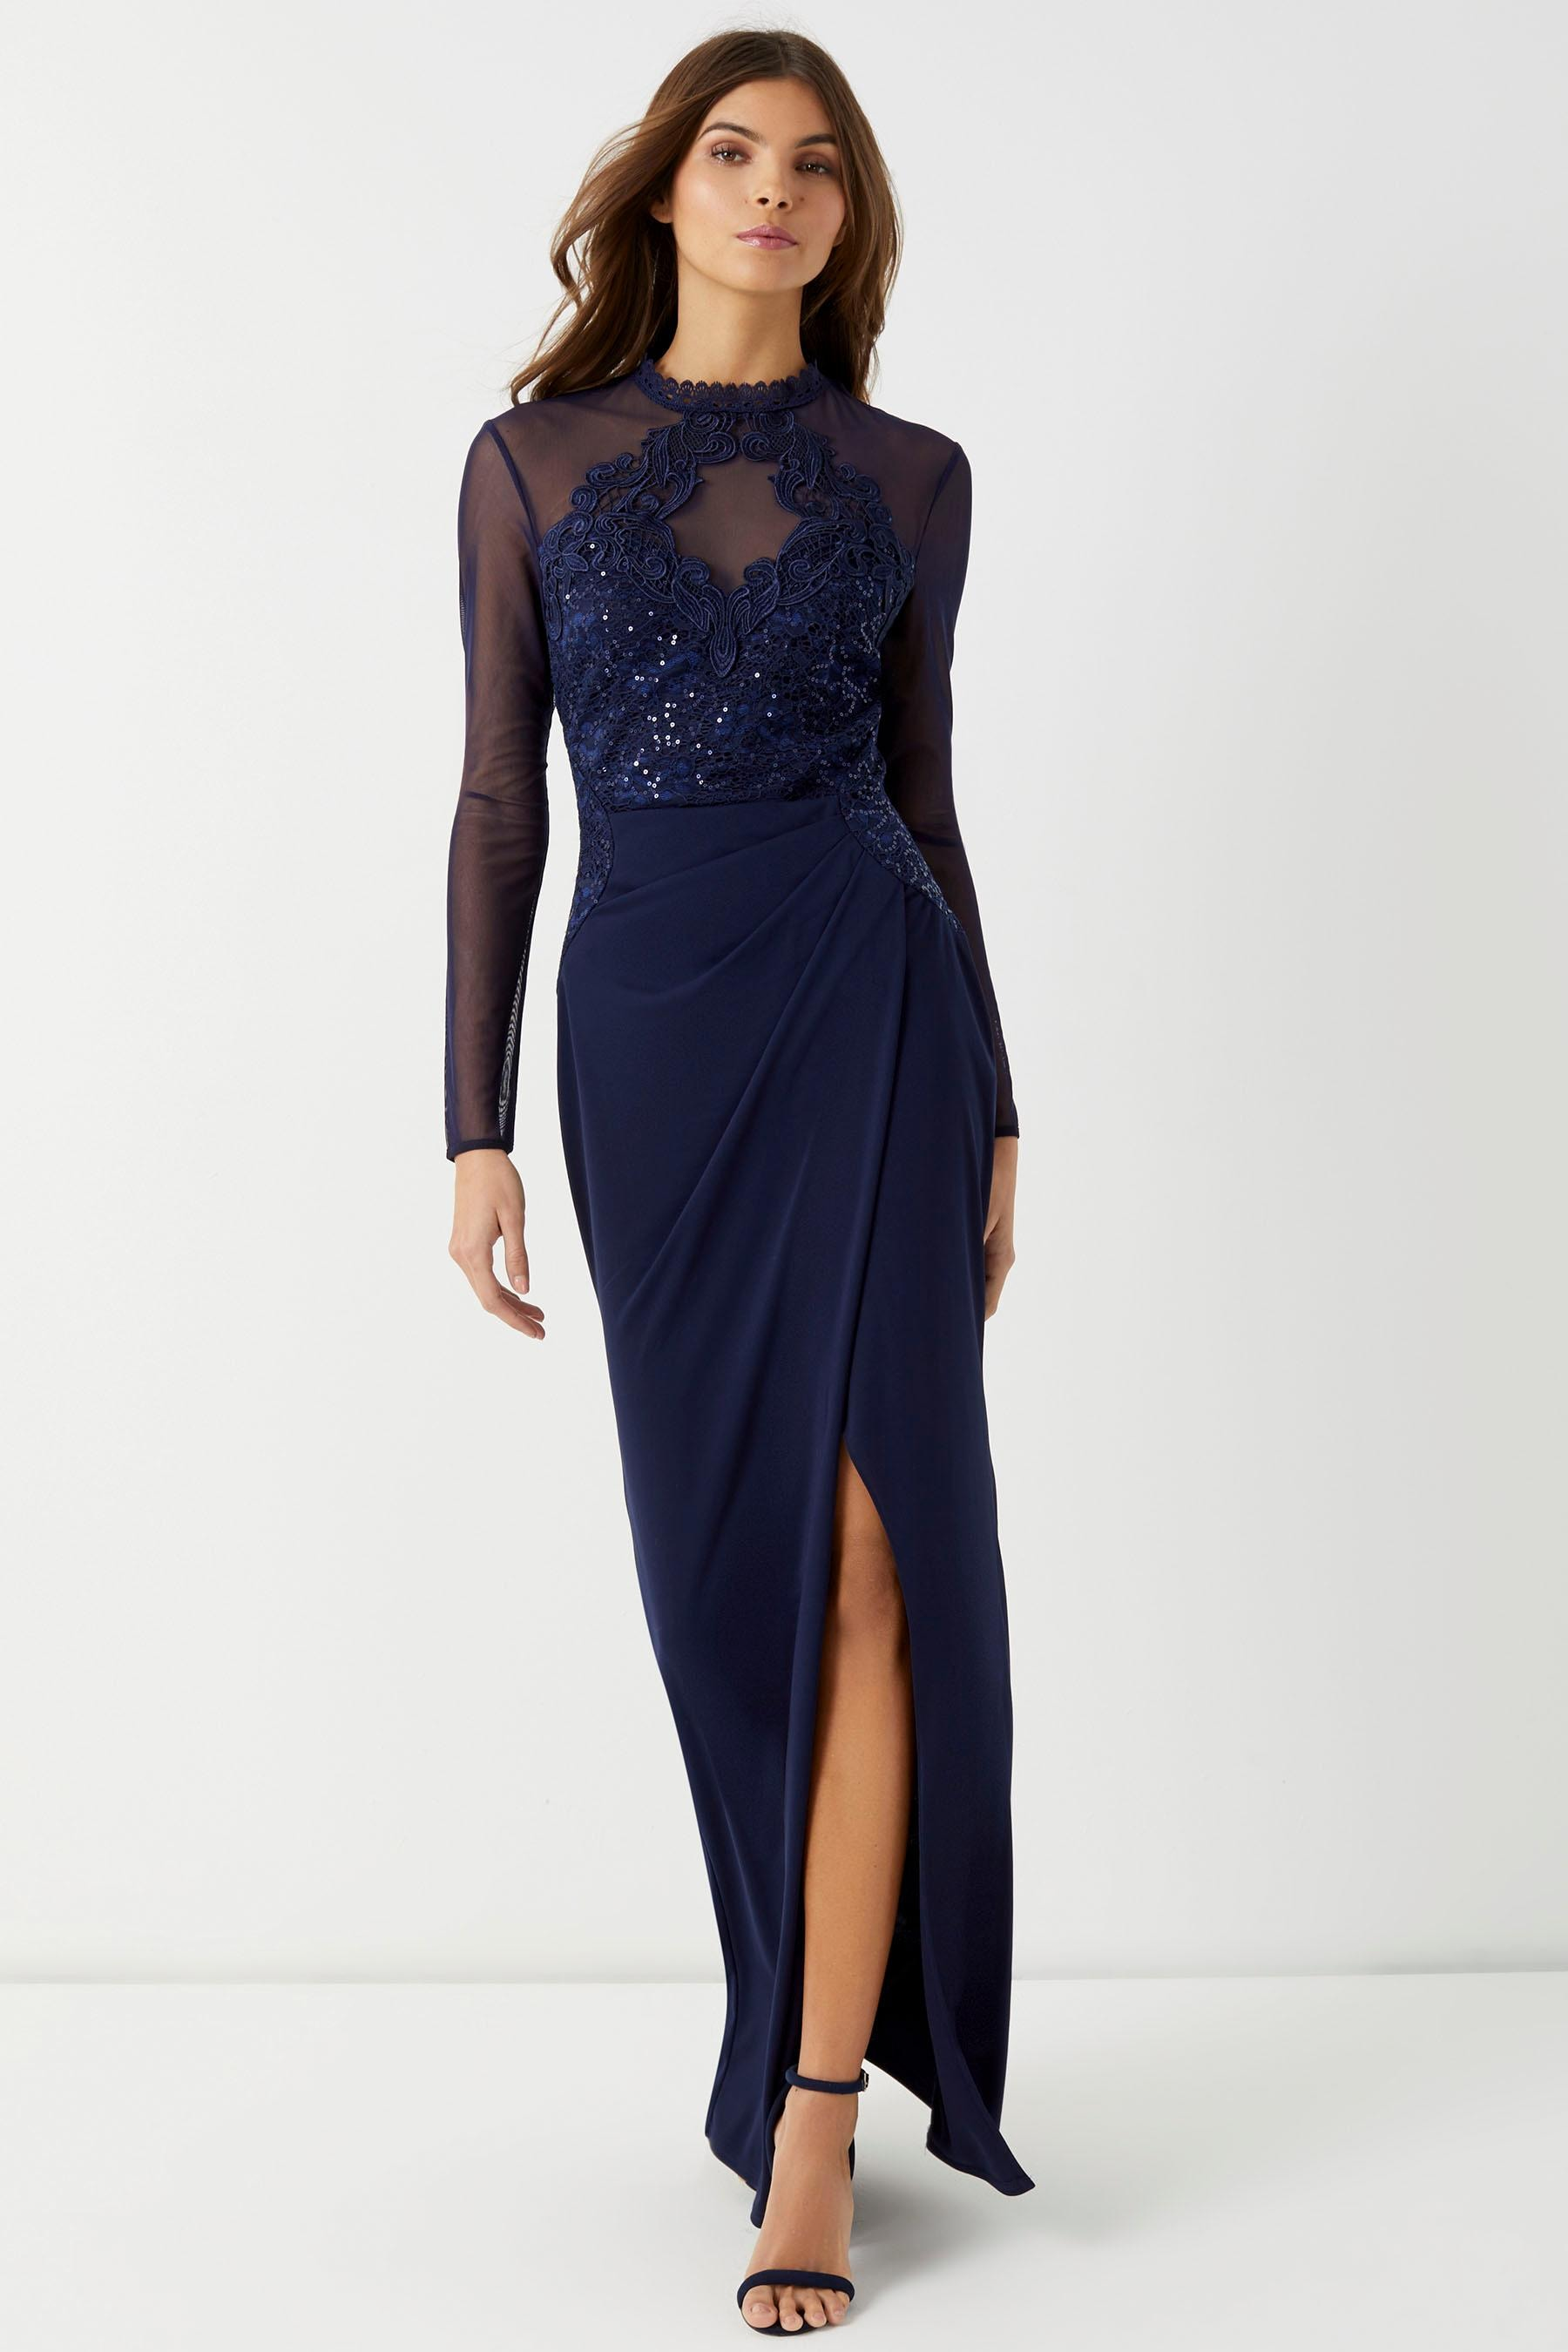 LIPSY Abendkleid Damenmode/Bekleidung/Kleider/Abendkleider